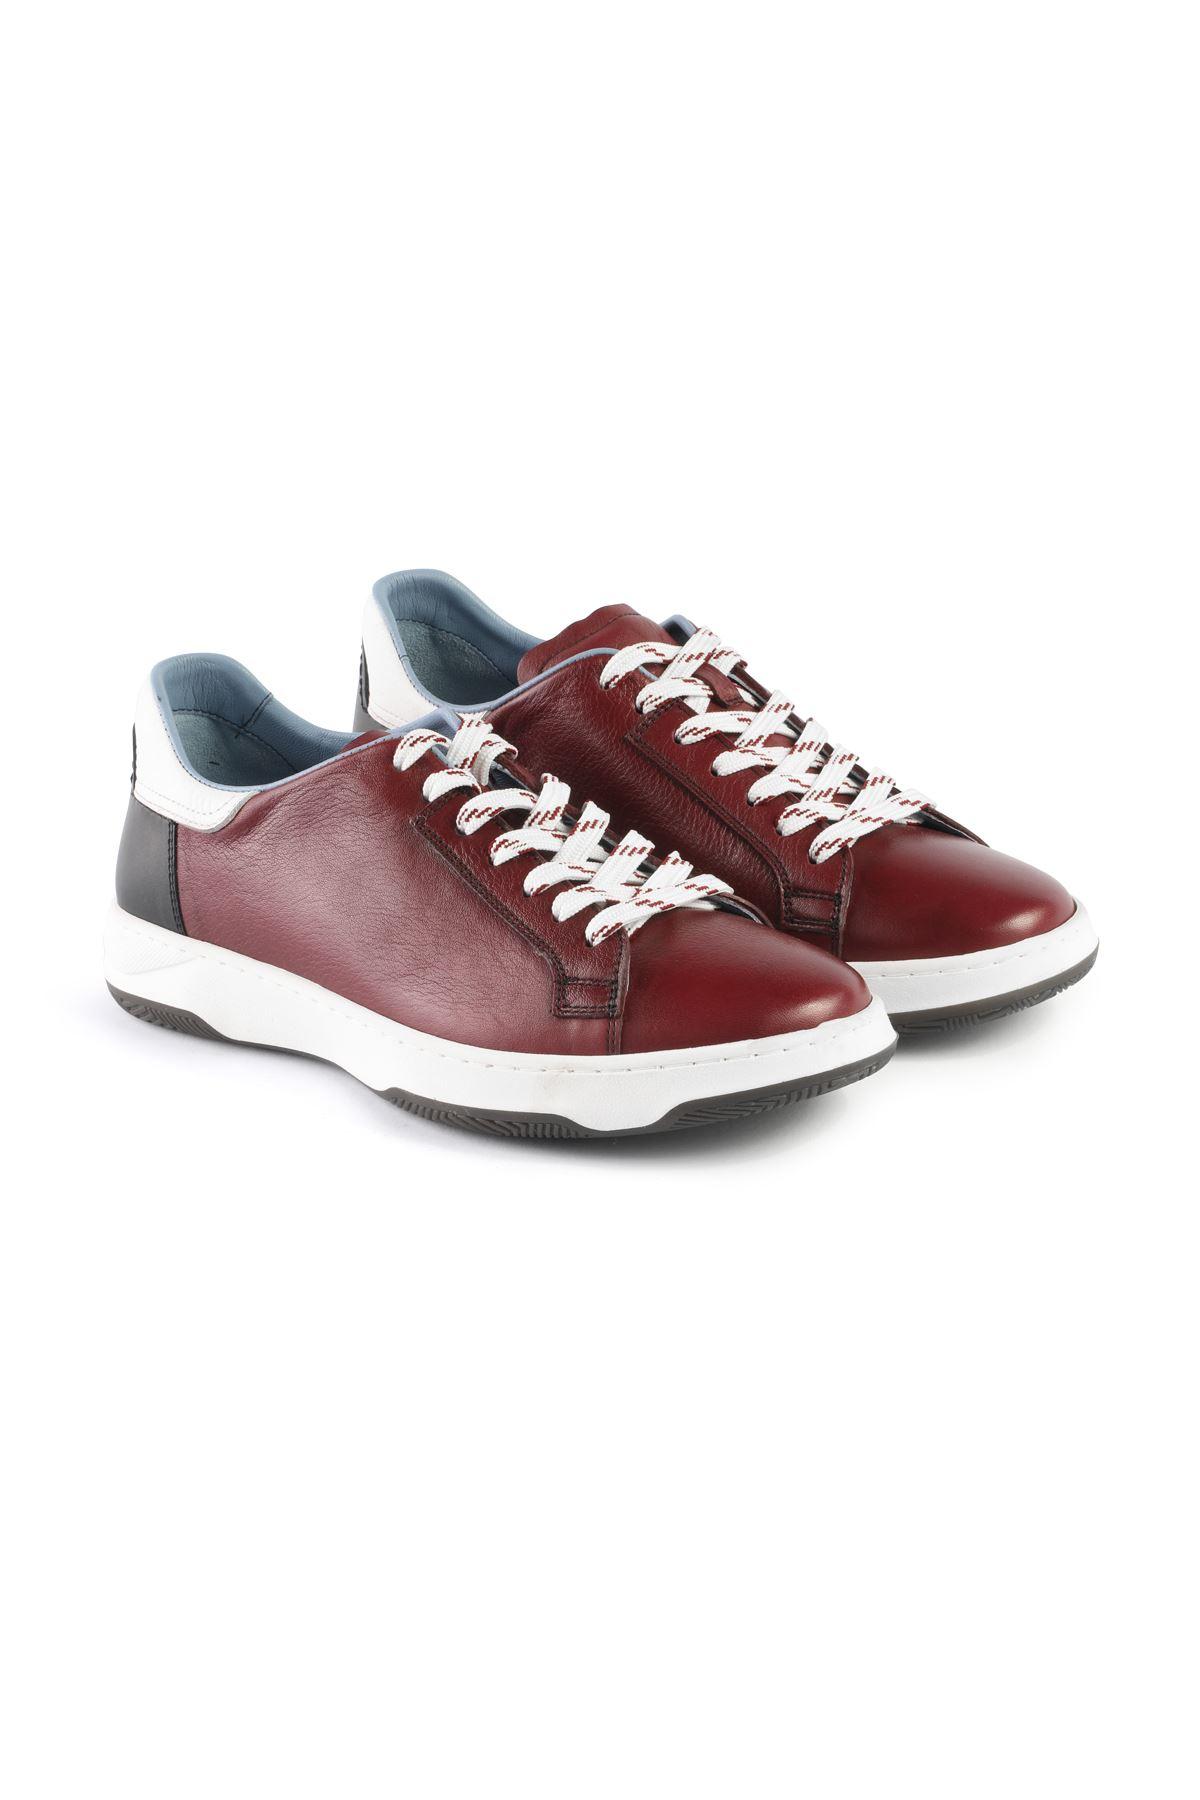 Libero L3227 Claret Red Sport Shoes